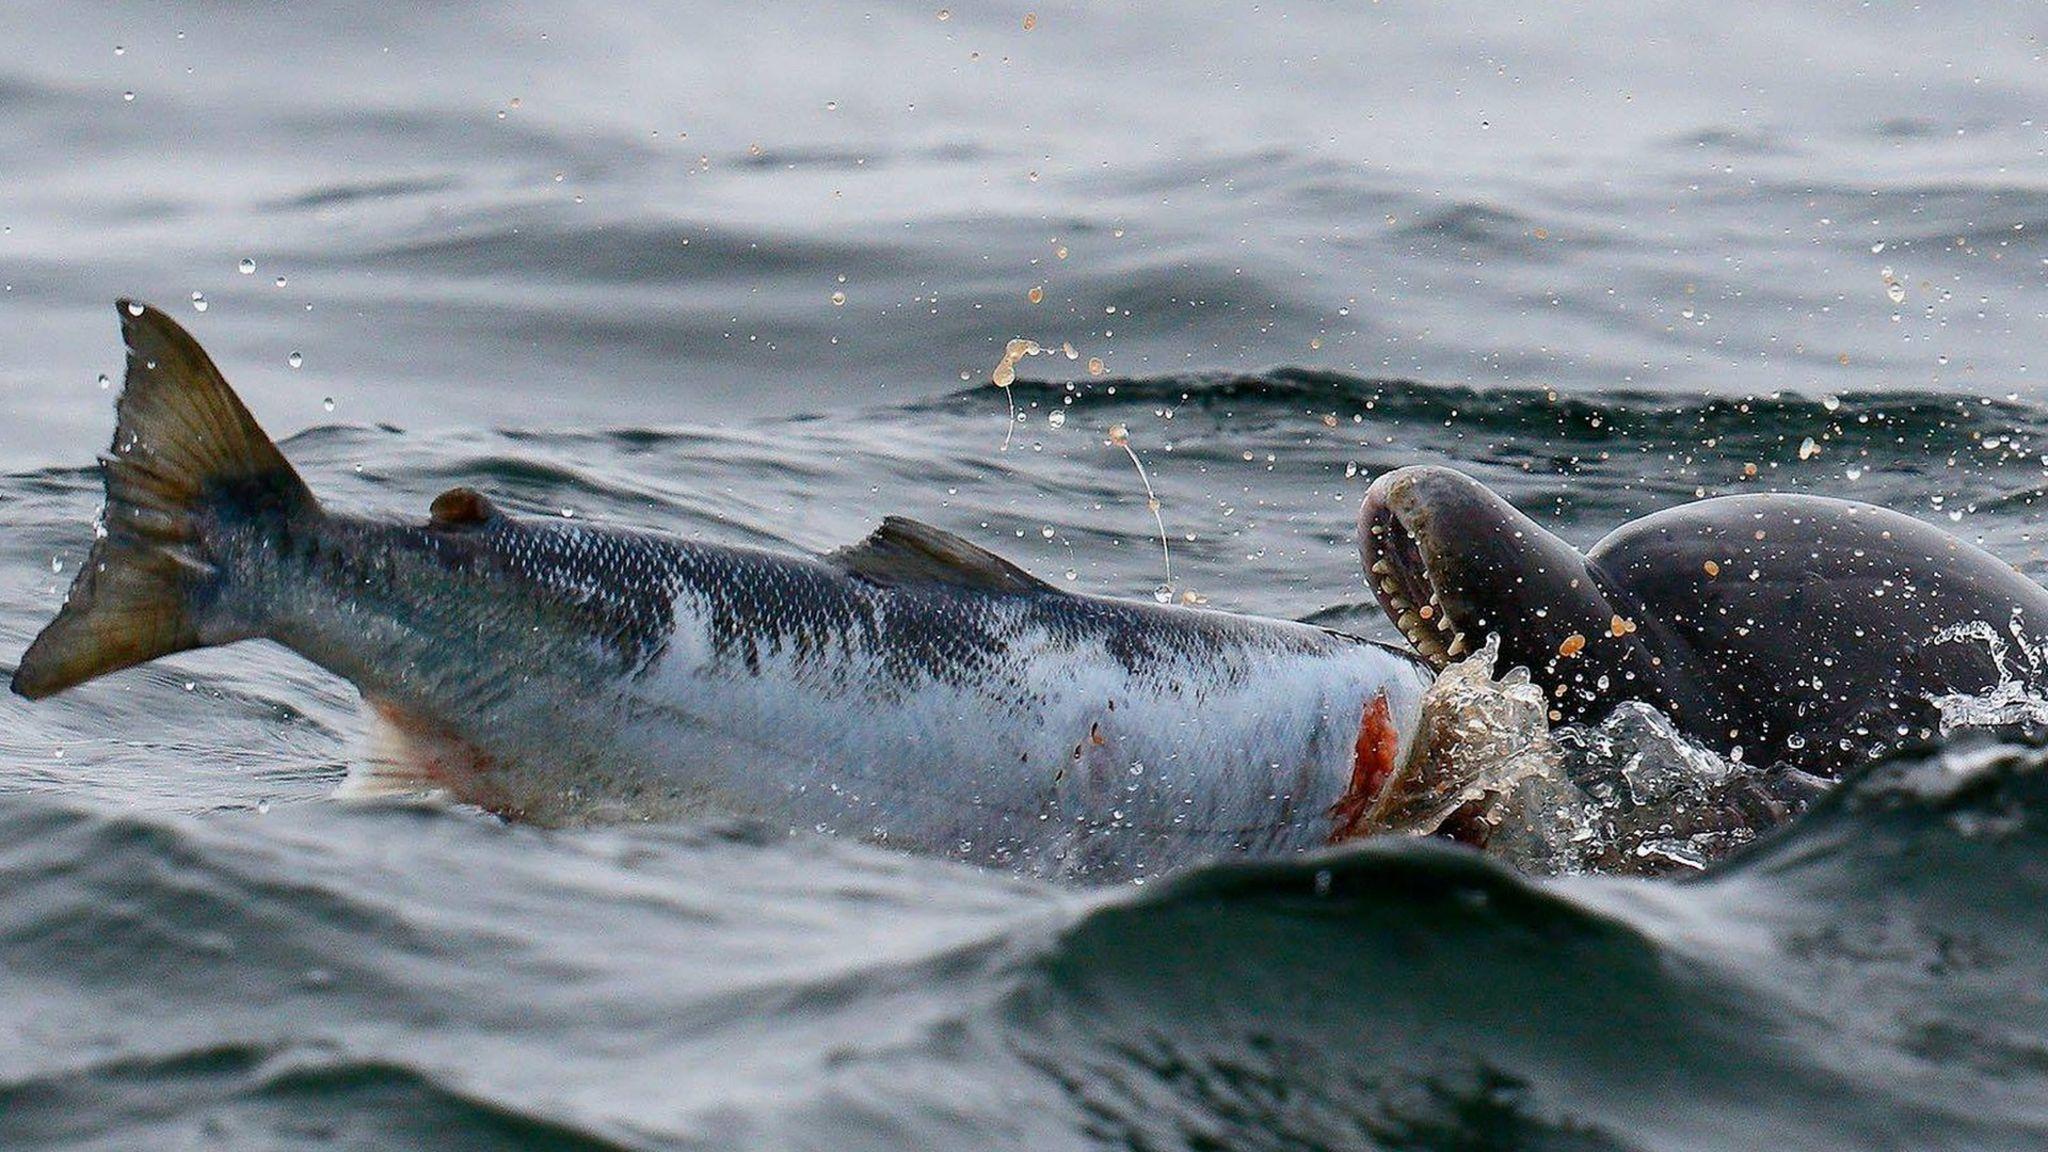 Bottlenose dolphin catching salmon